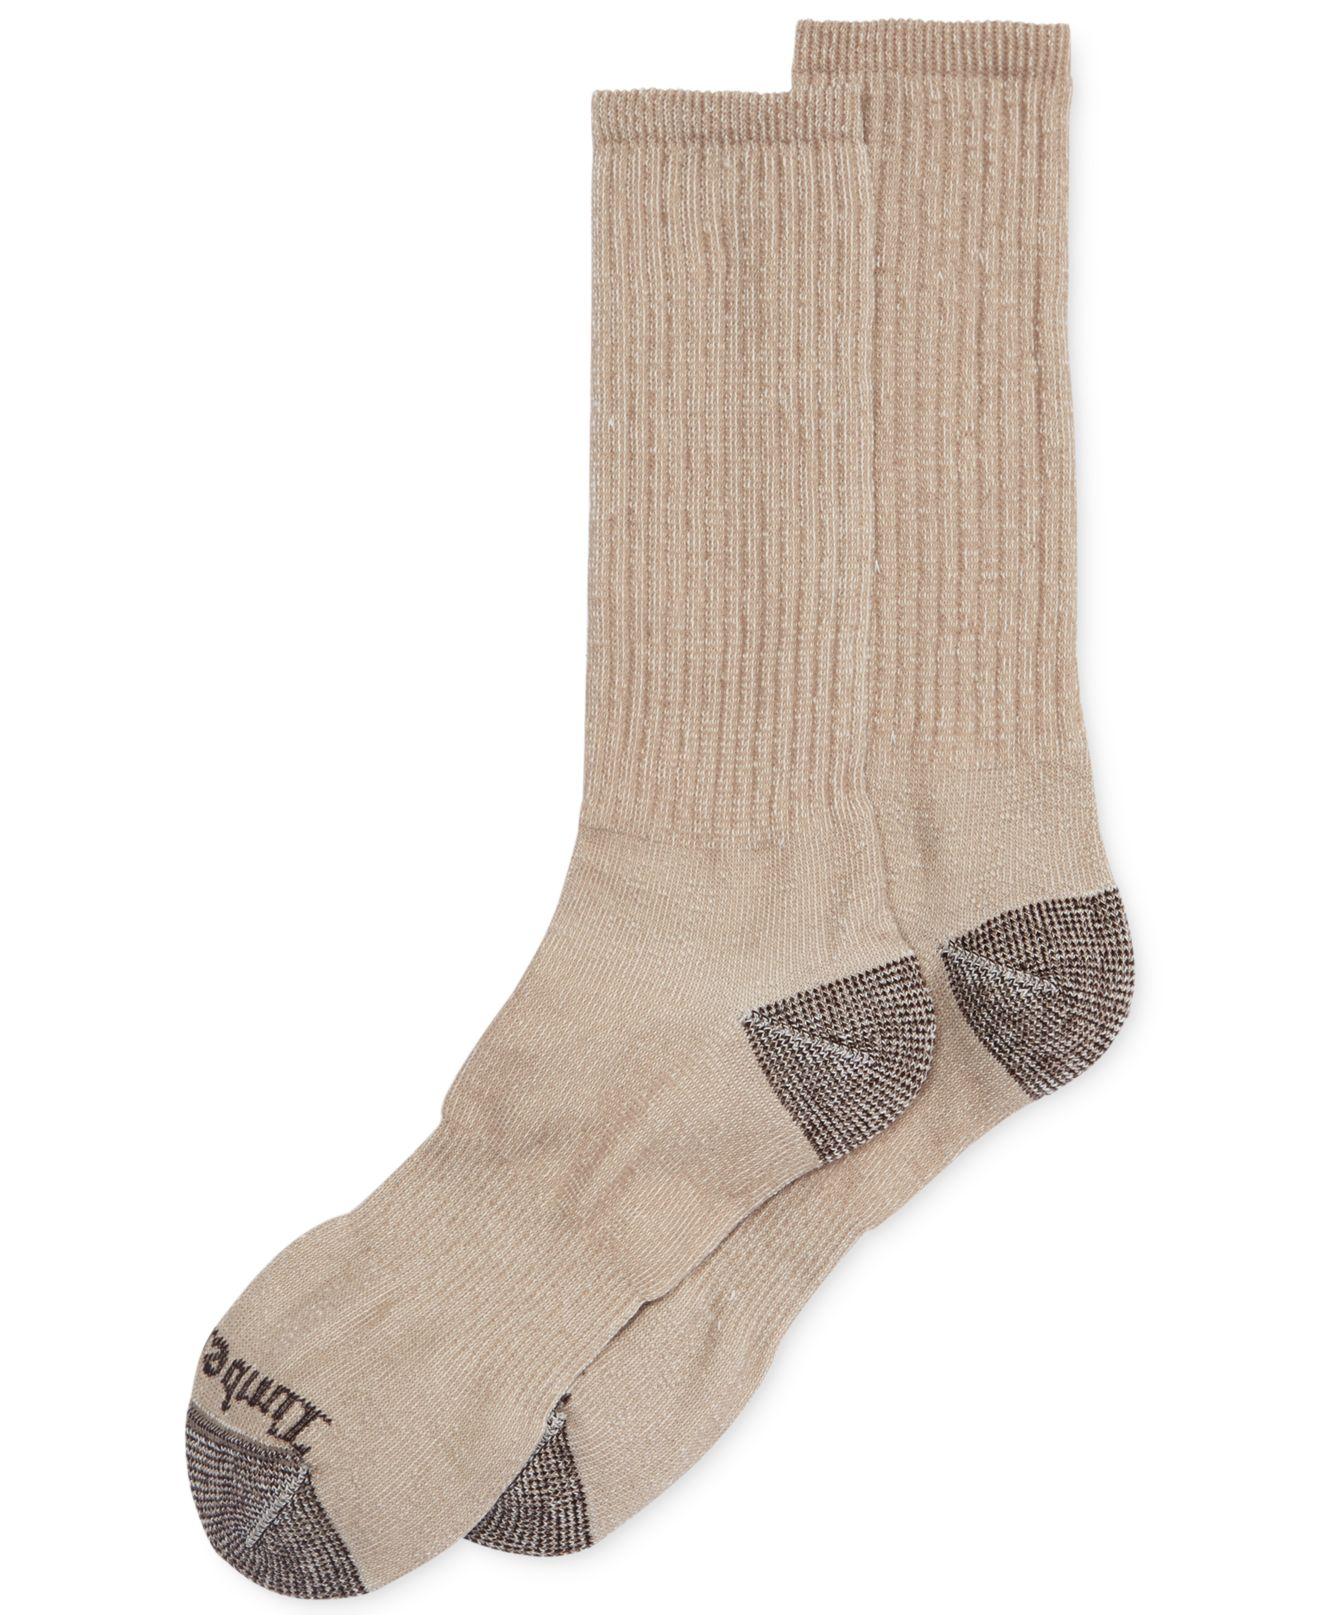 aca7c9fca34c Timberland Men's Mid-weight Merino Wool Crew Socks 2-pack in Natural ...